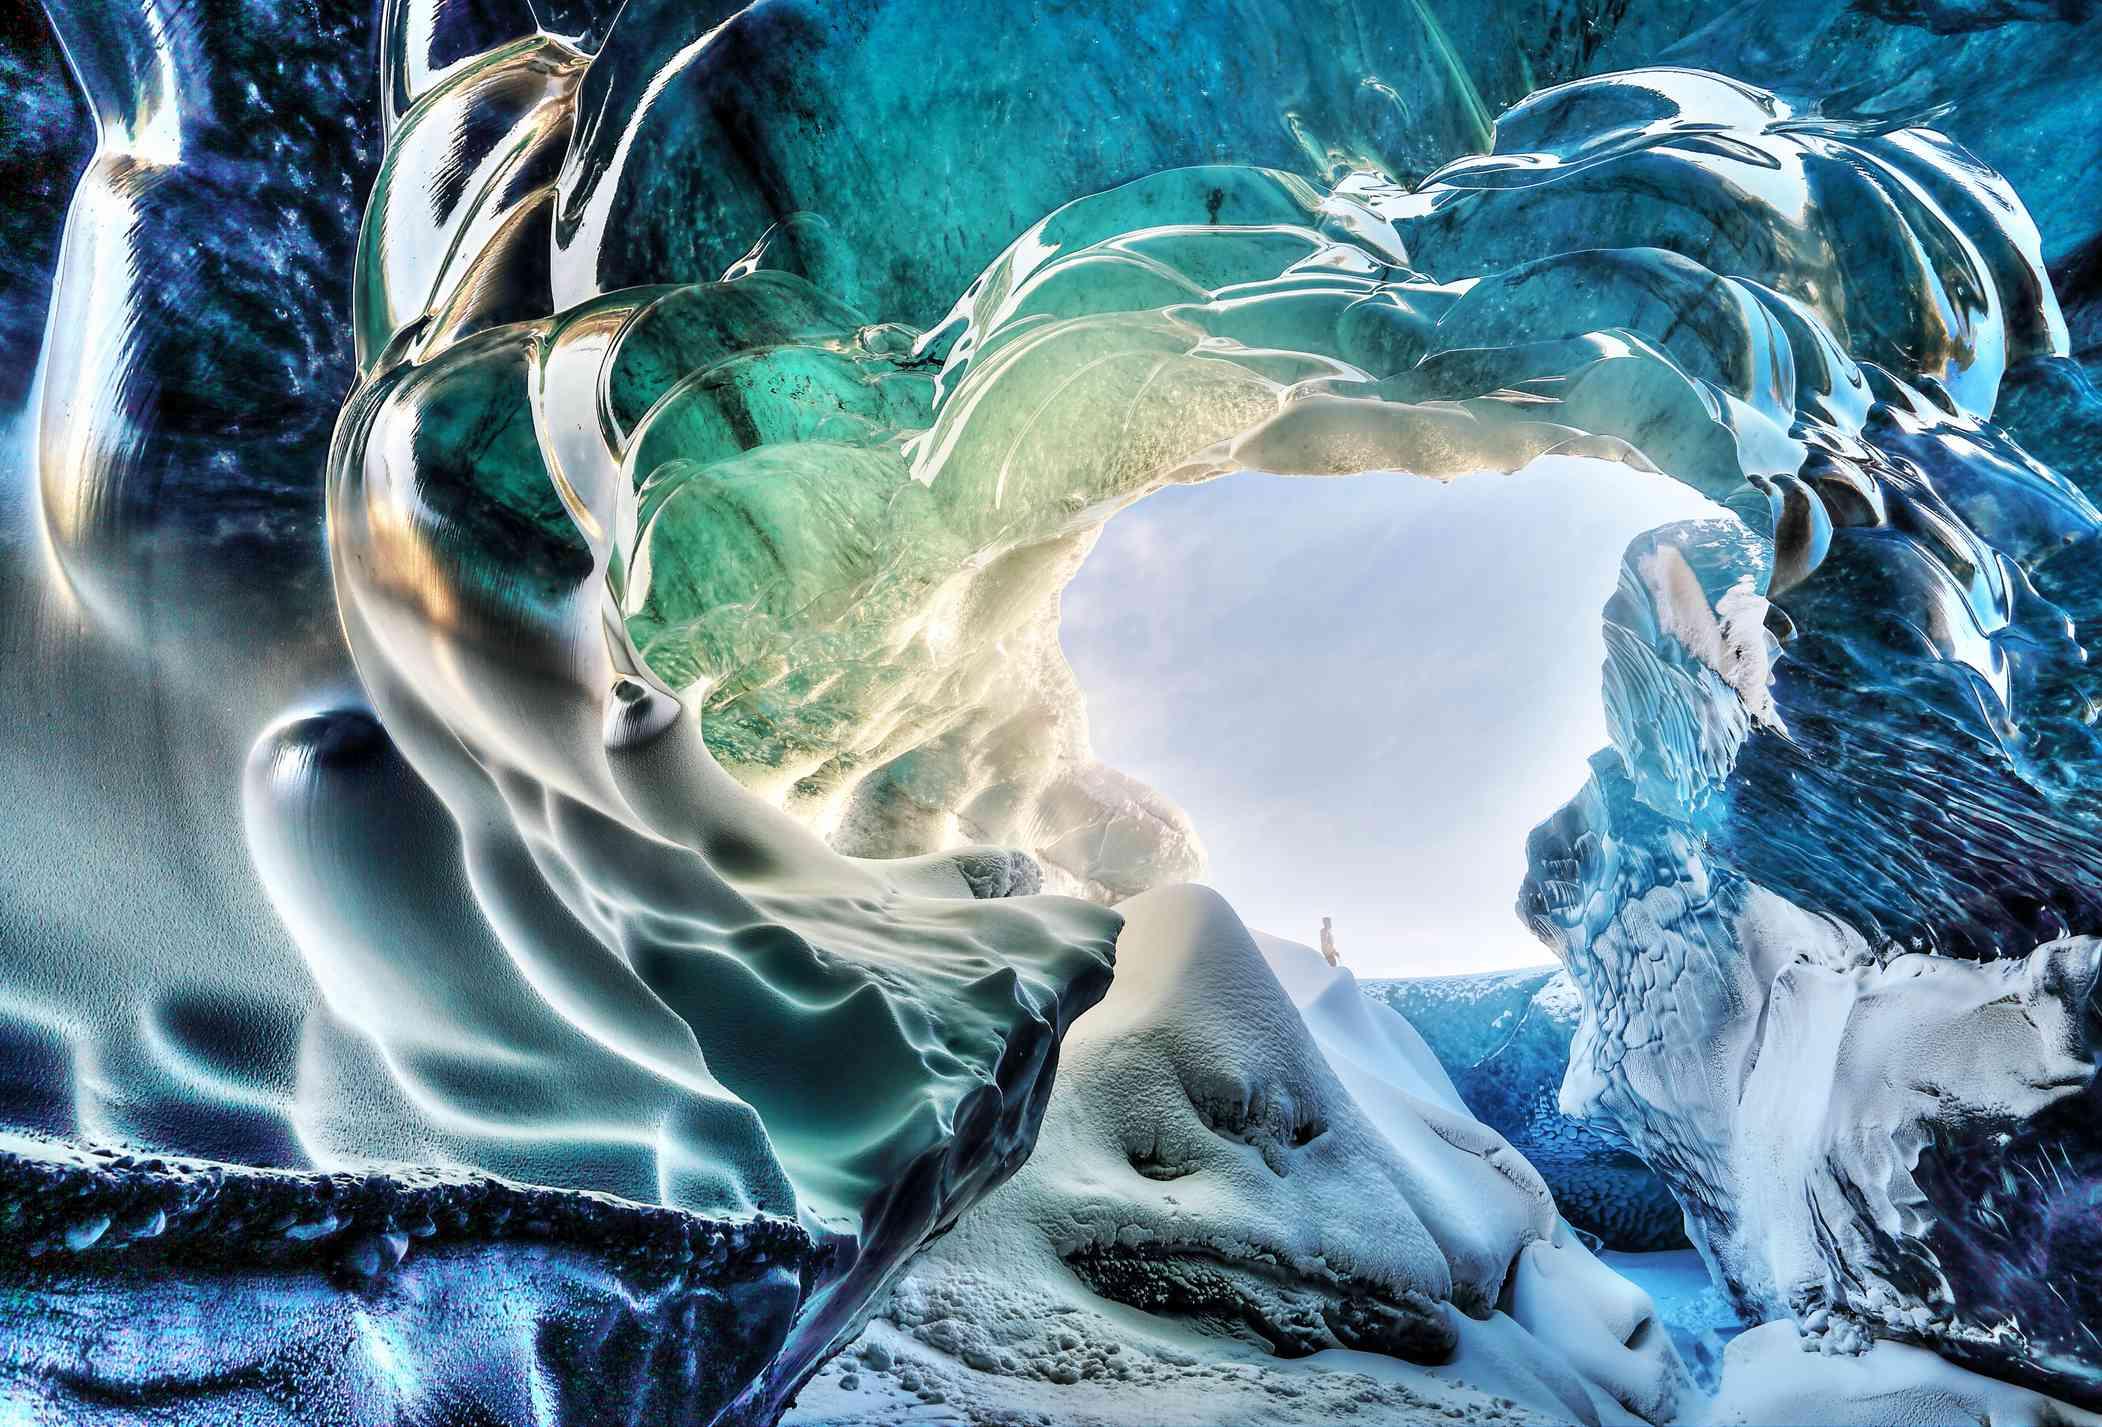 Breidamerkurjokull ice cave in Iceland